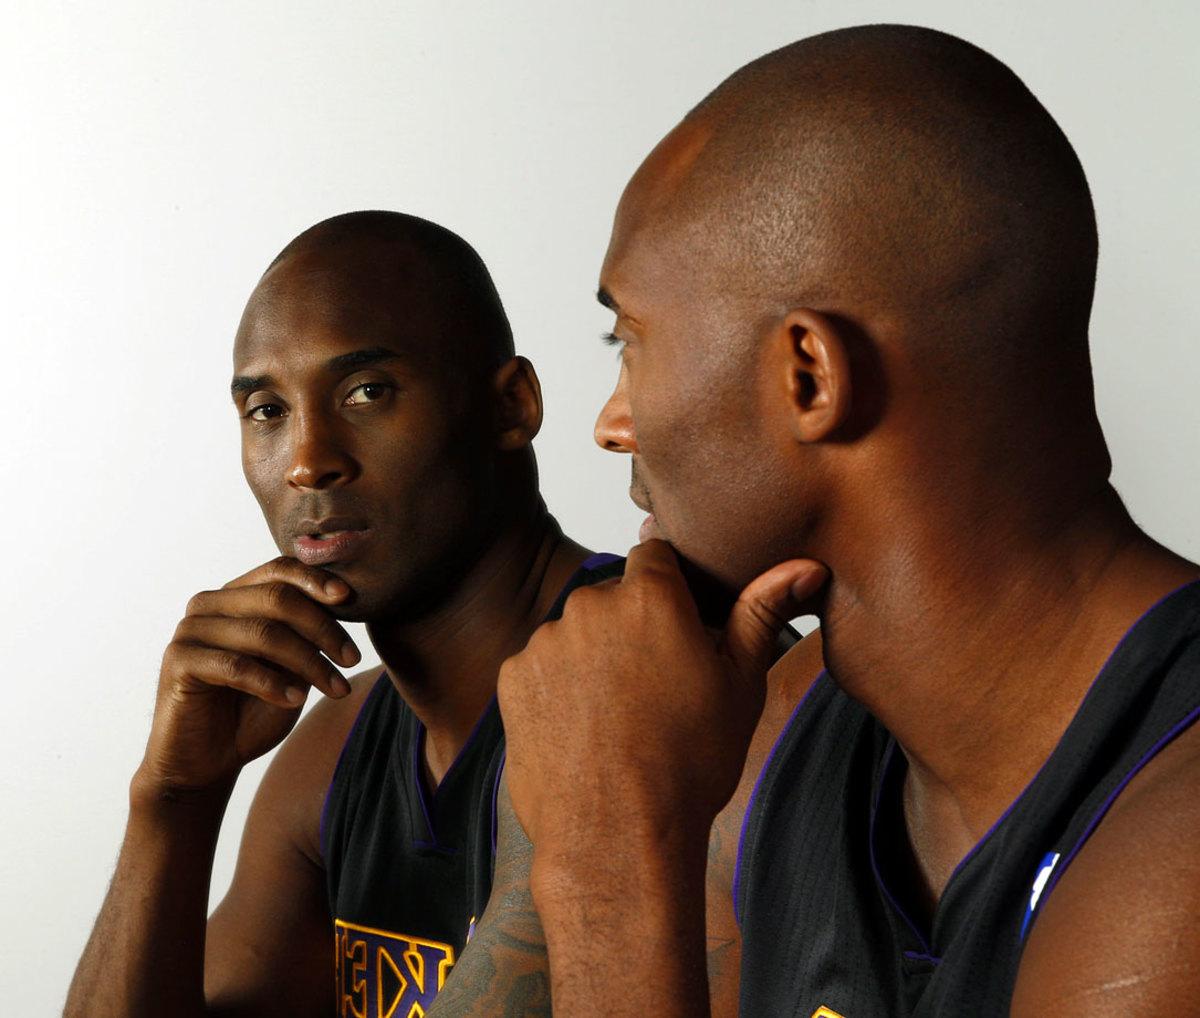 2013-1009-Kobe-Bryant-op72-35601.jpg